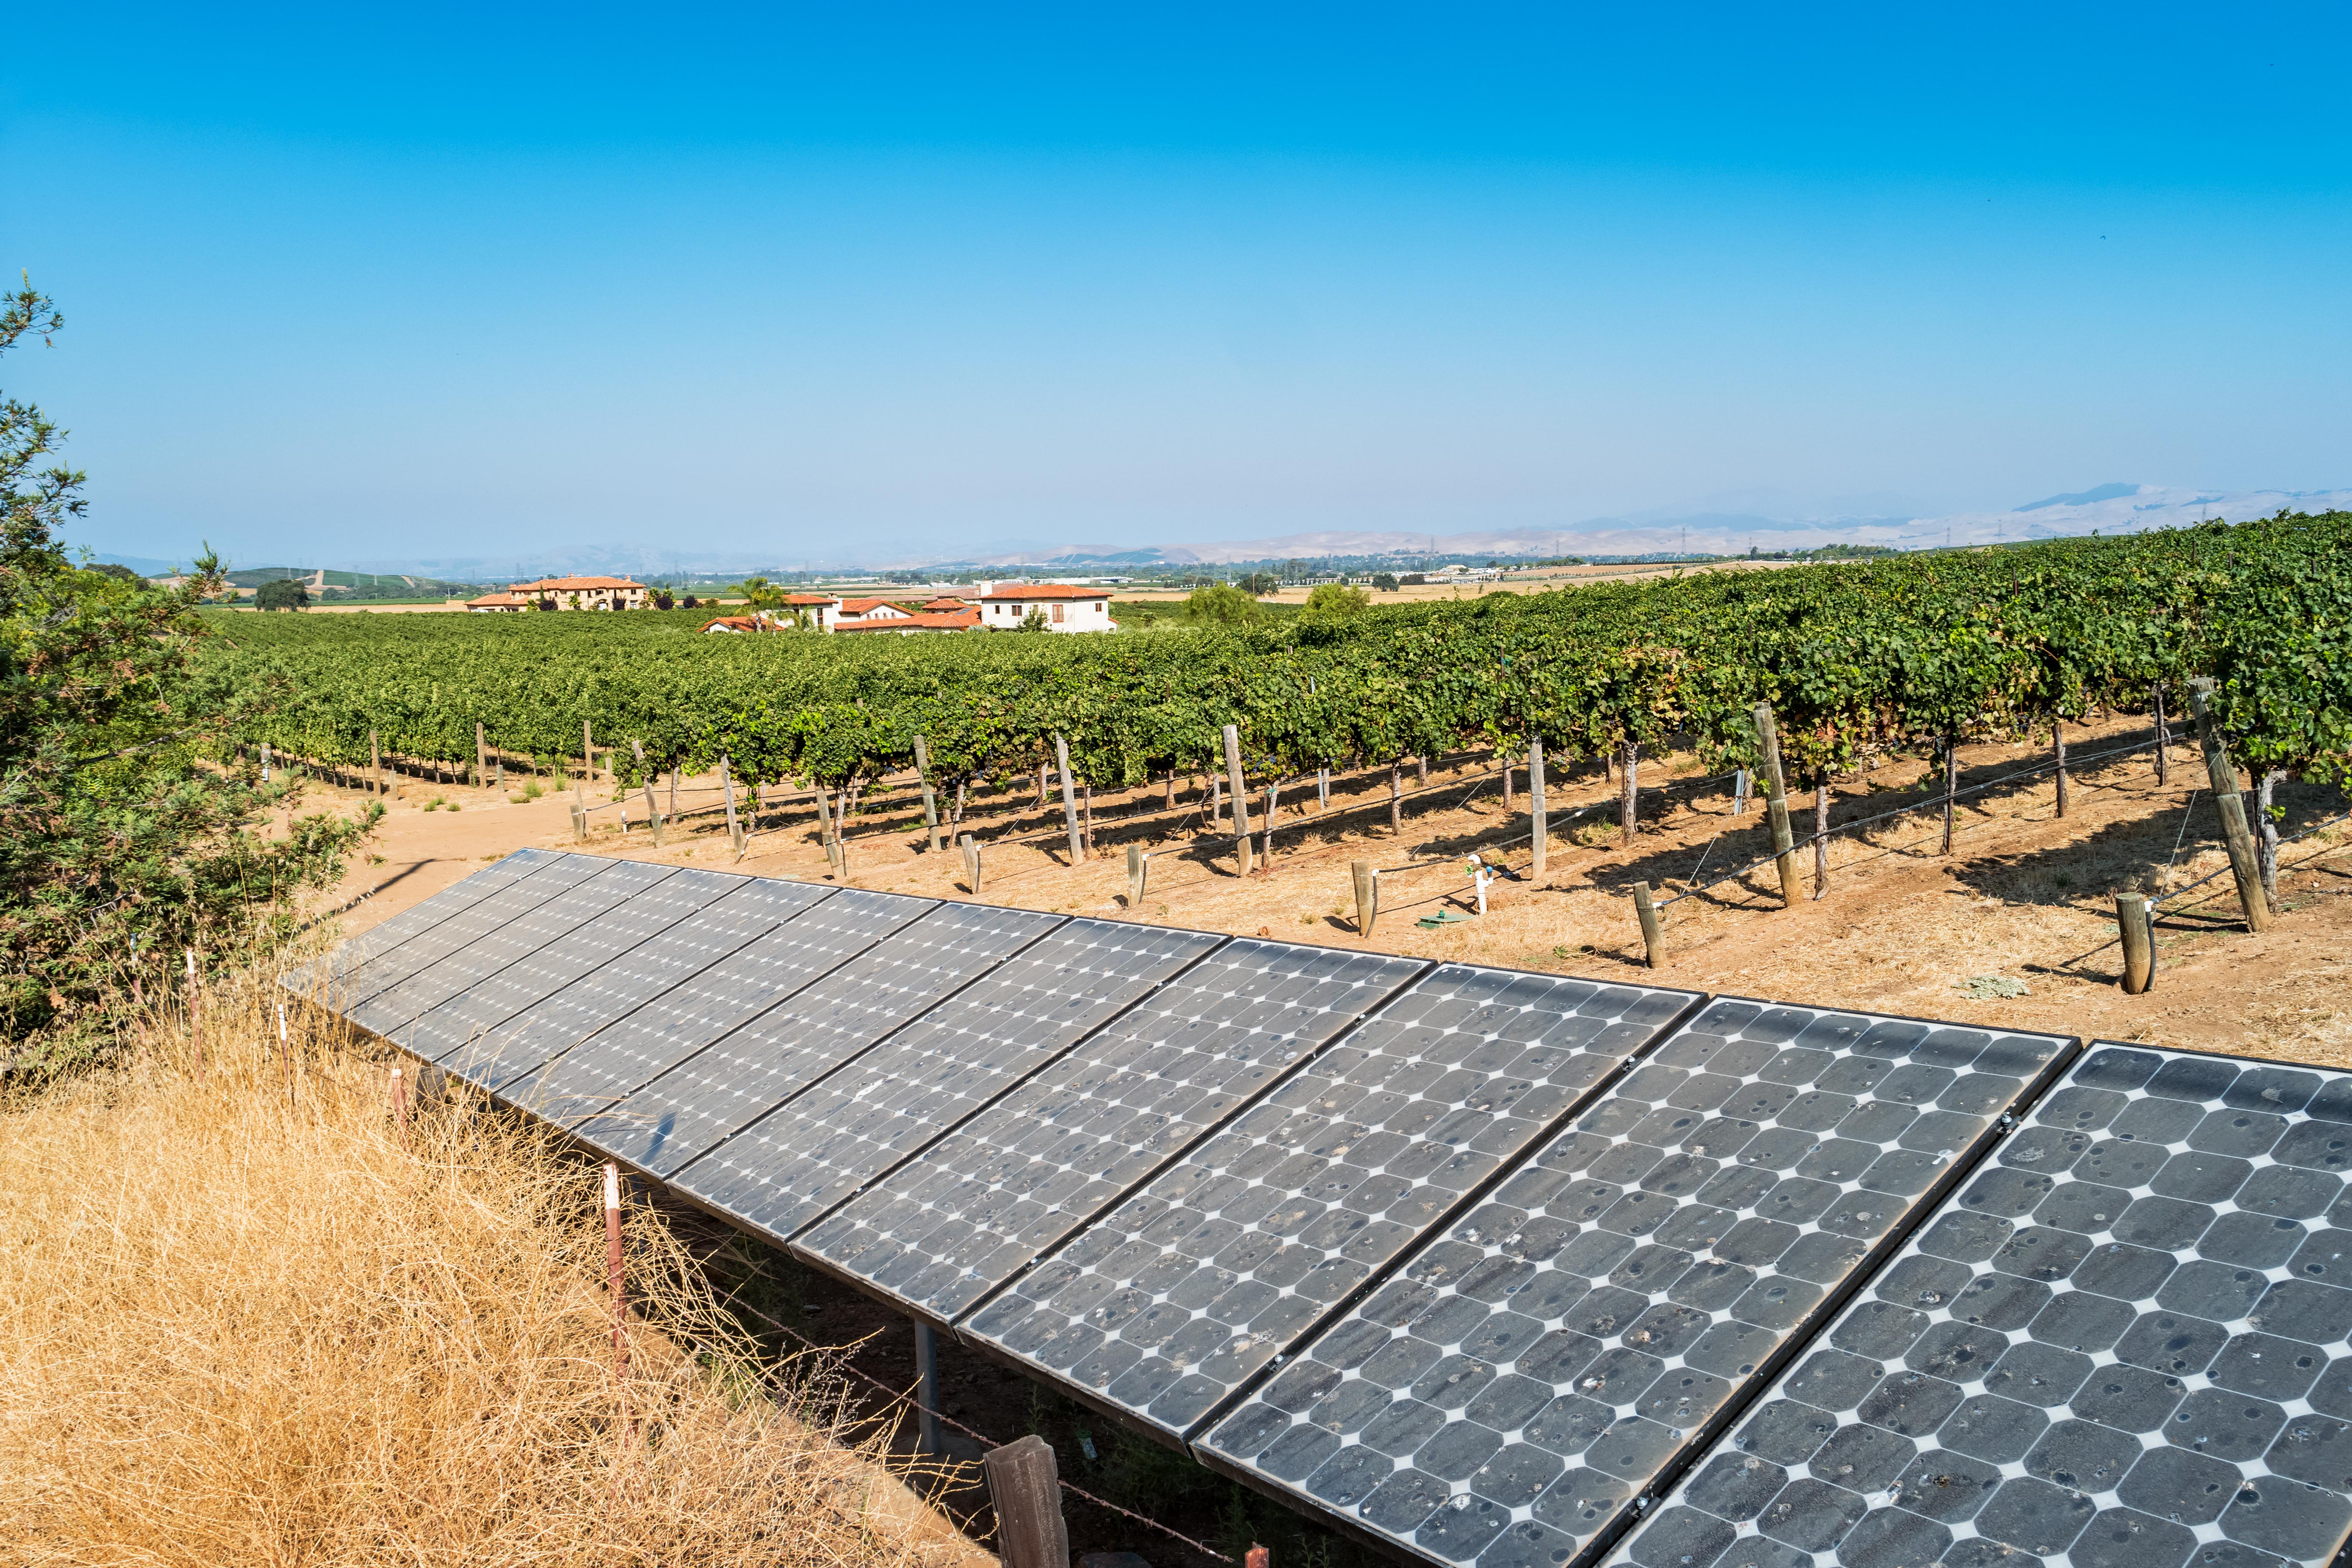 Solar panels at a vineyard in California USA